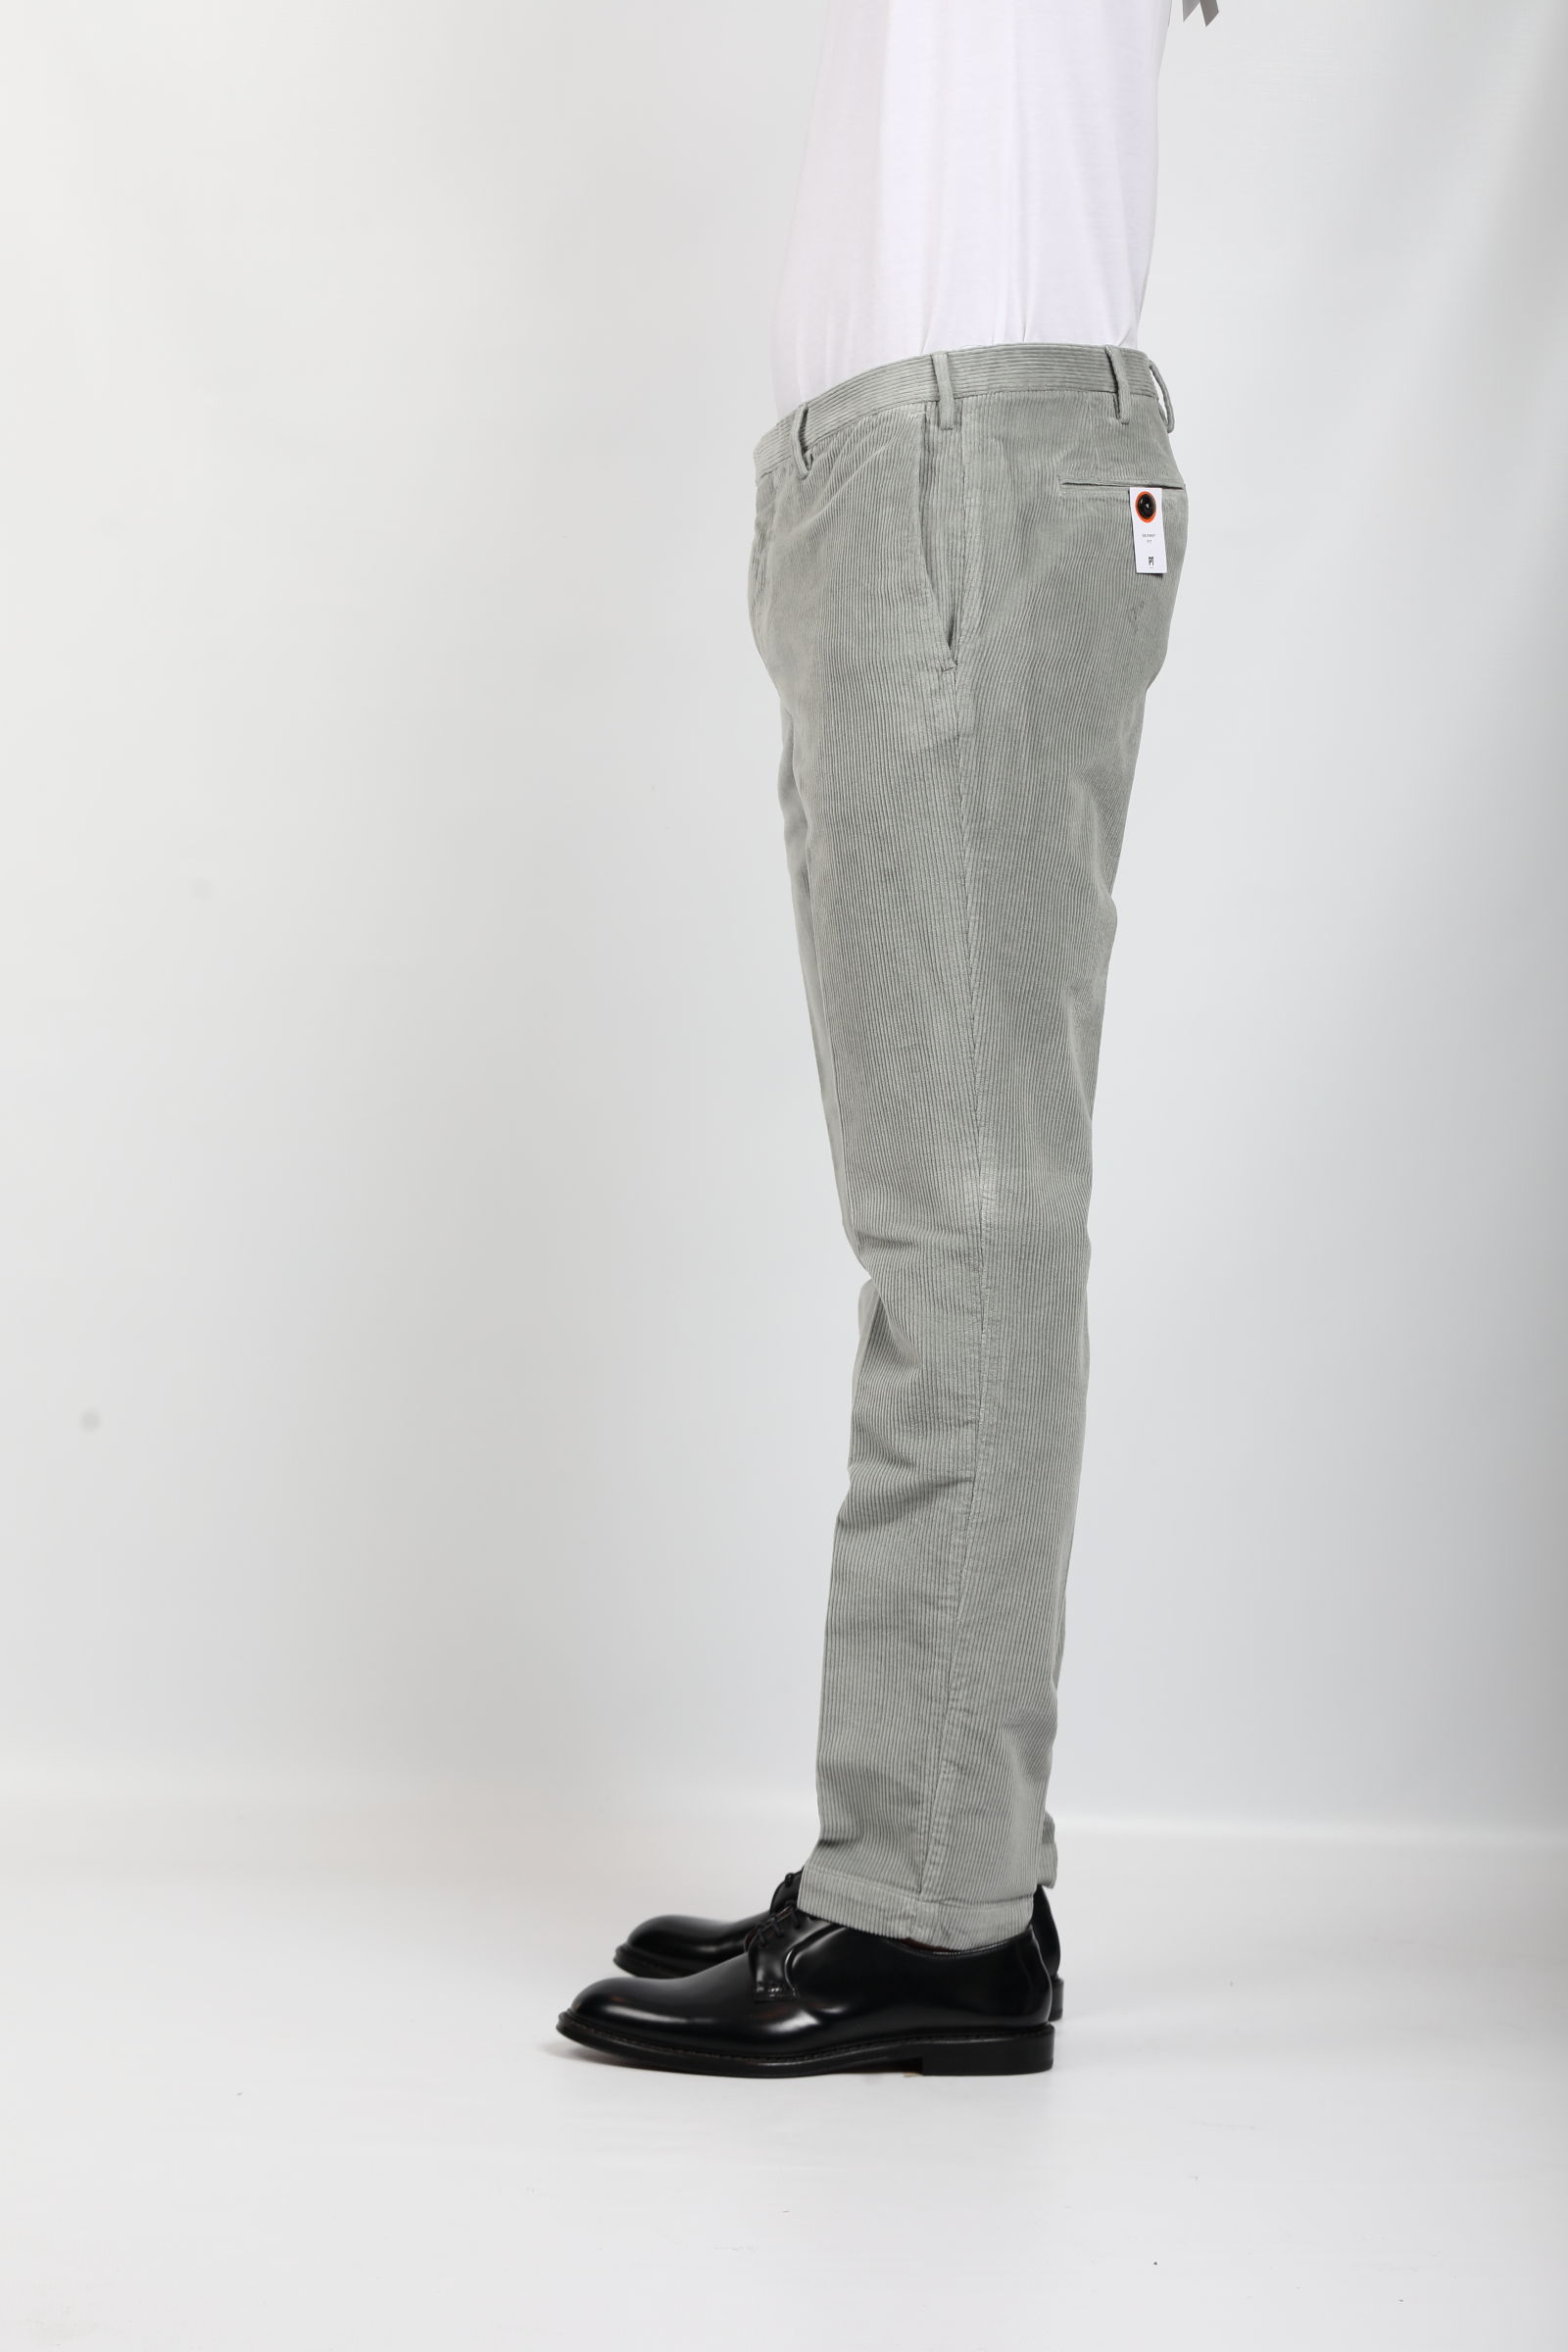 VELVET TROUSERS PT TORINO | Pants | KTZEZ00CL1-PU320224